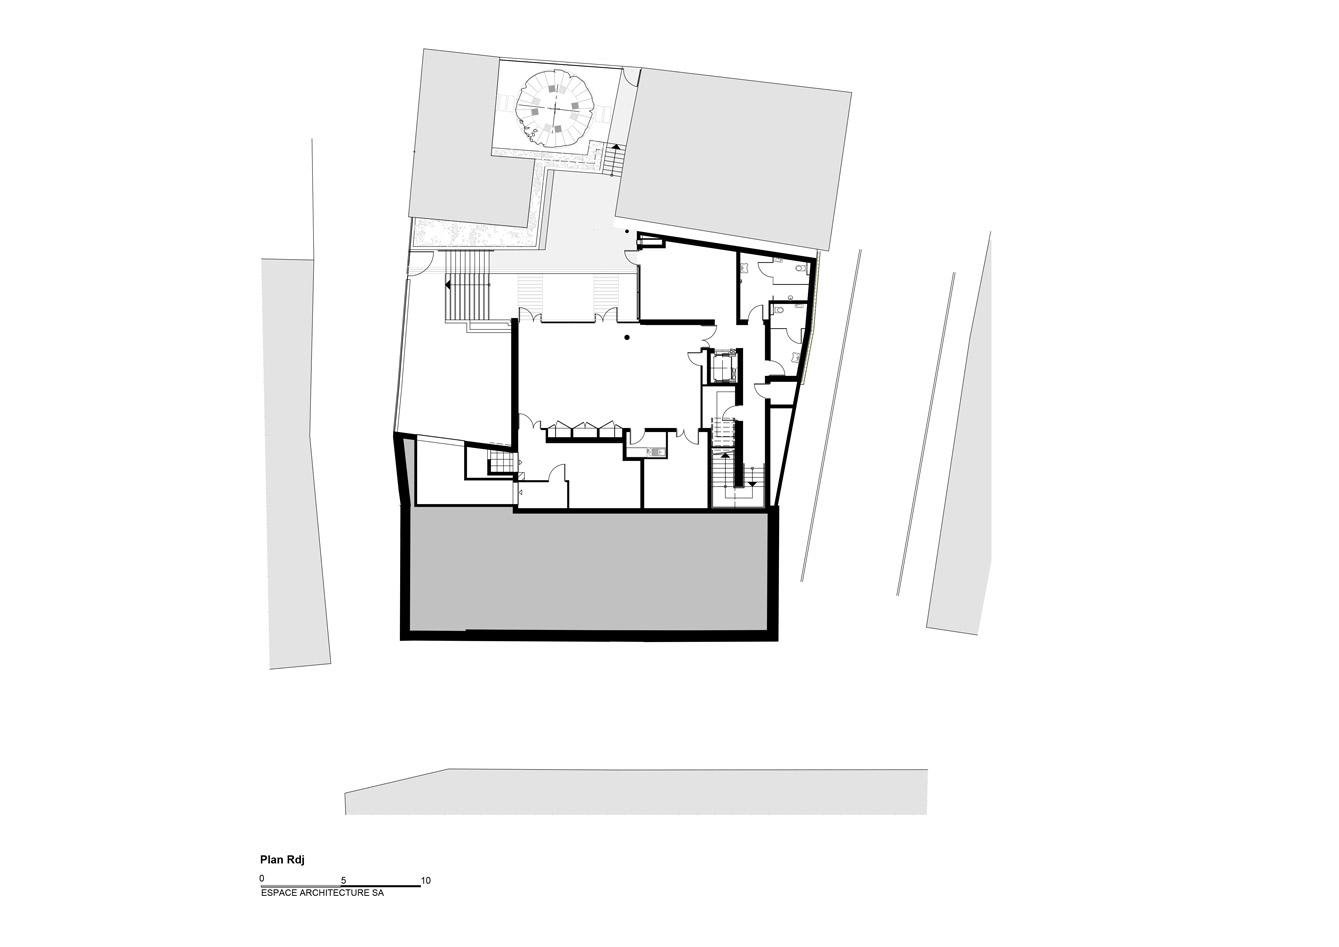 Mediatheque-Faulquemont_Plan-RdJ